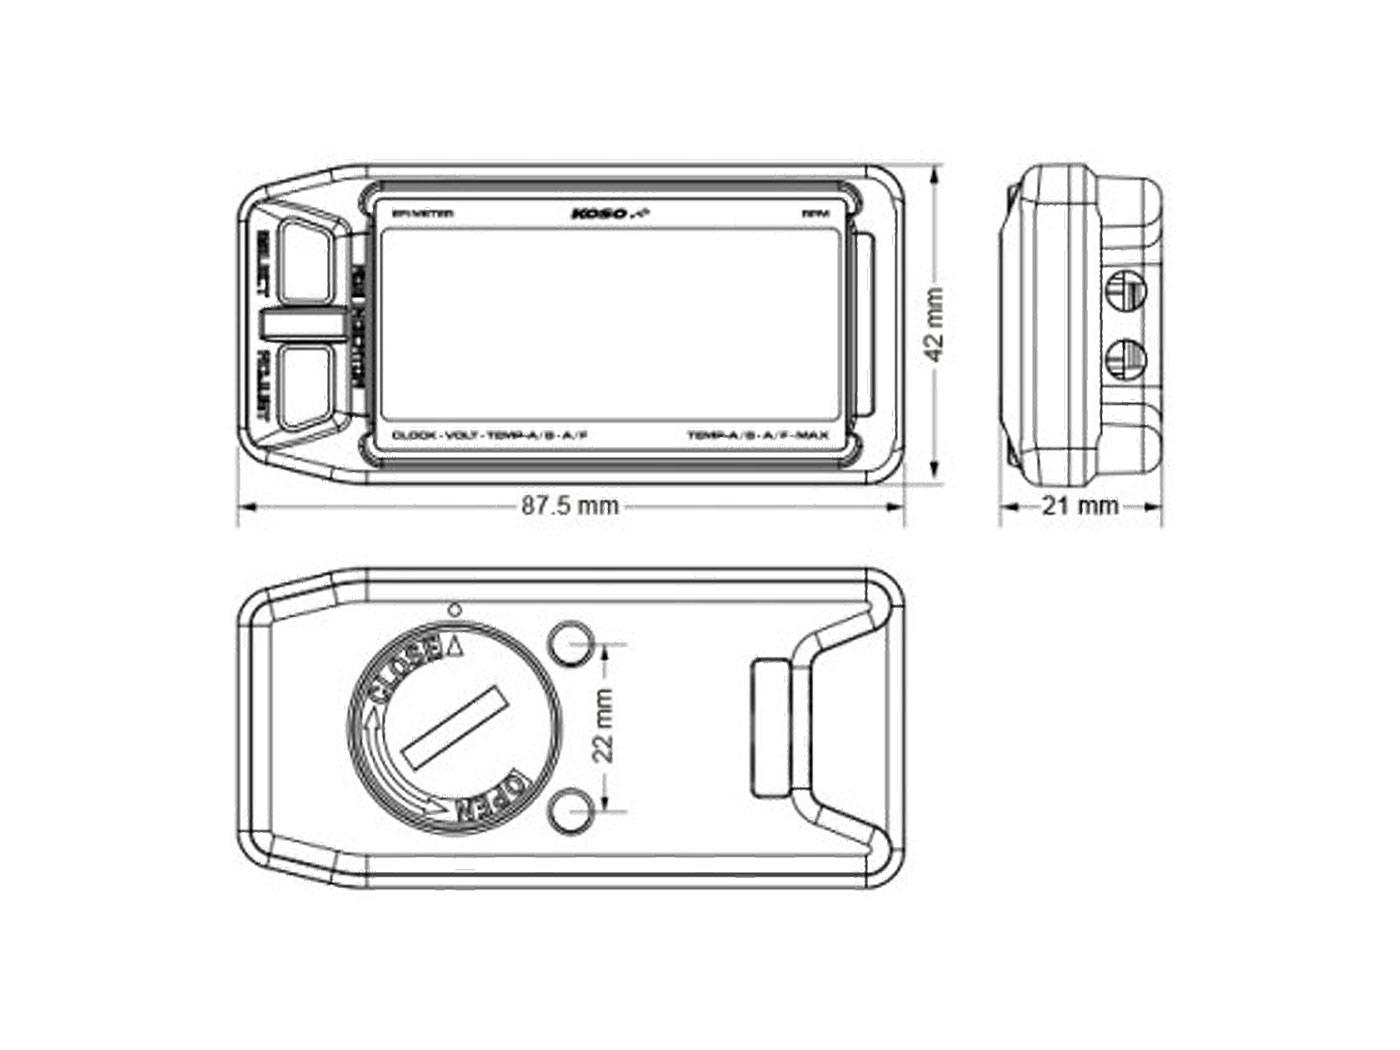 Dazon Click 150 Wiring Diagram. . Wiring Diagram on